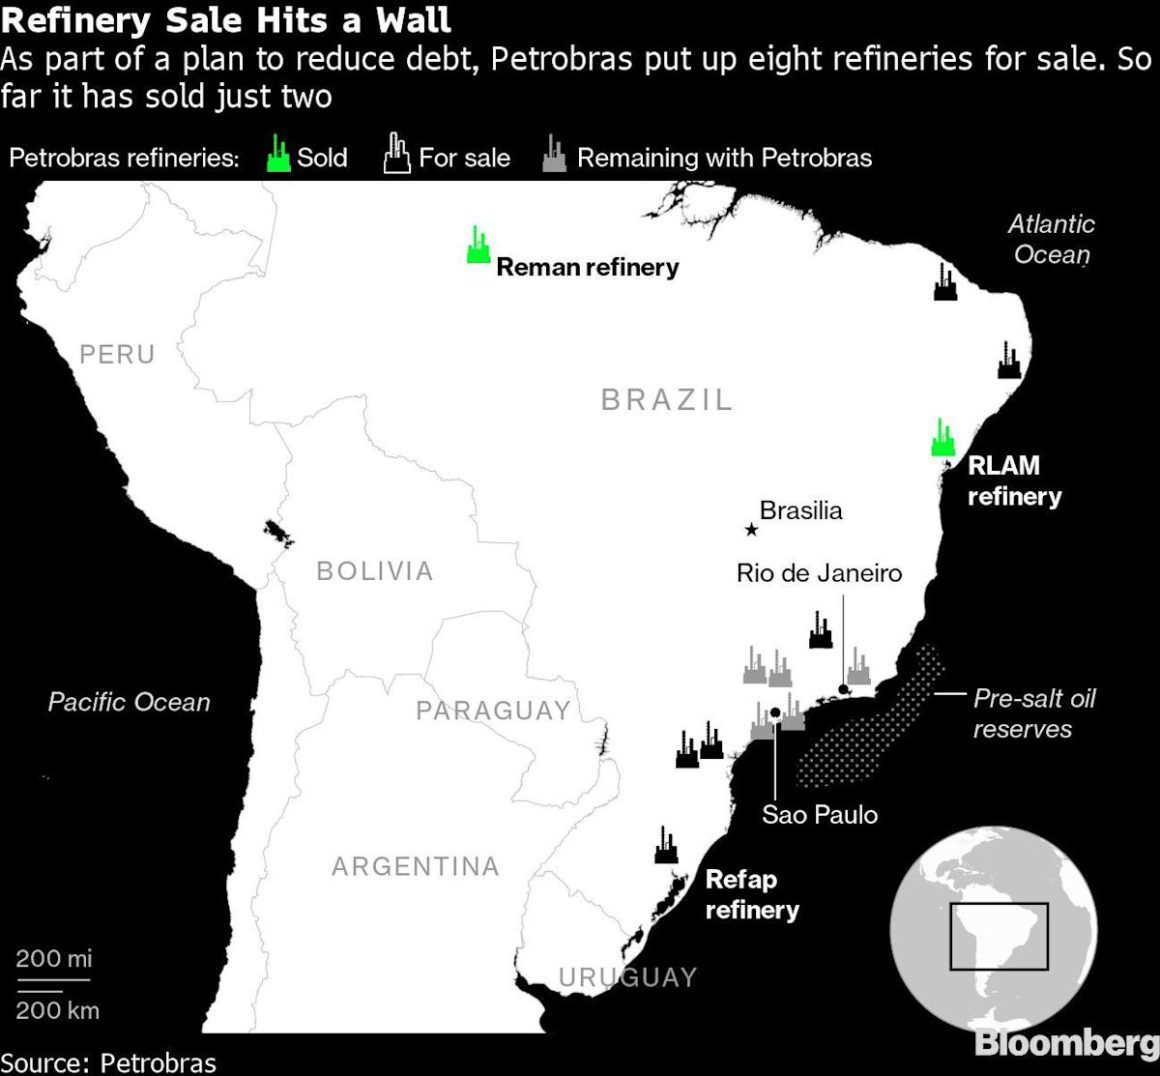 Privatization plans mask problems at Petrobras